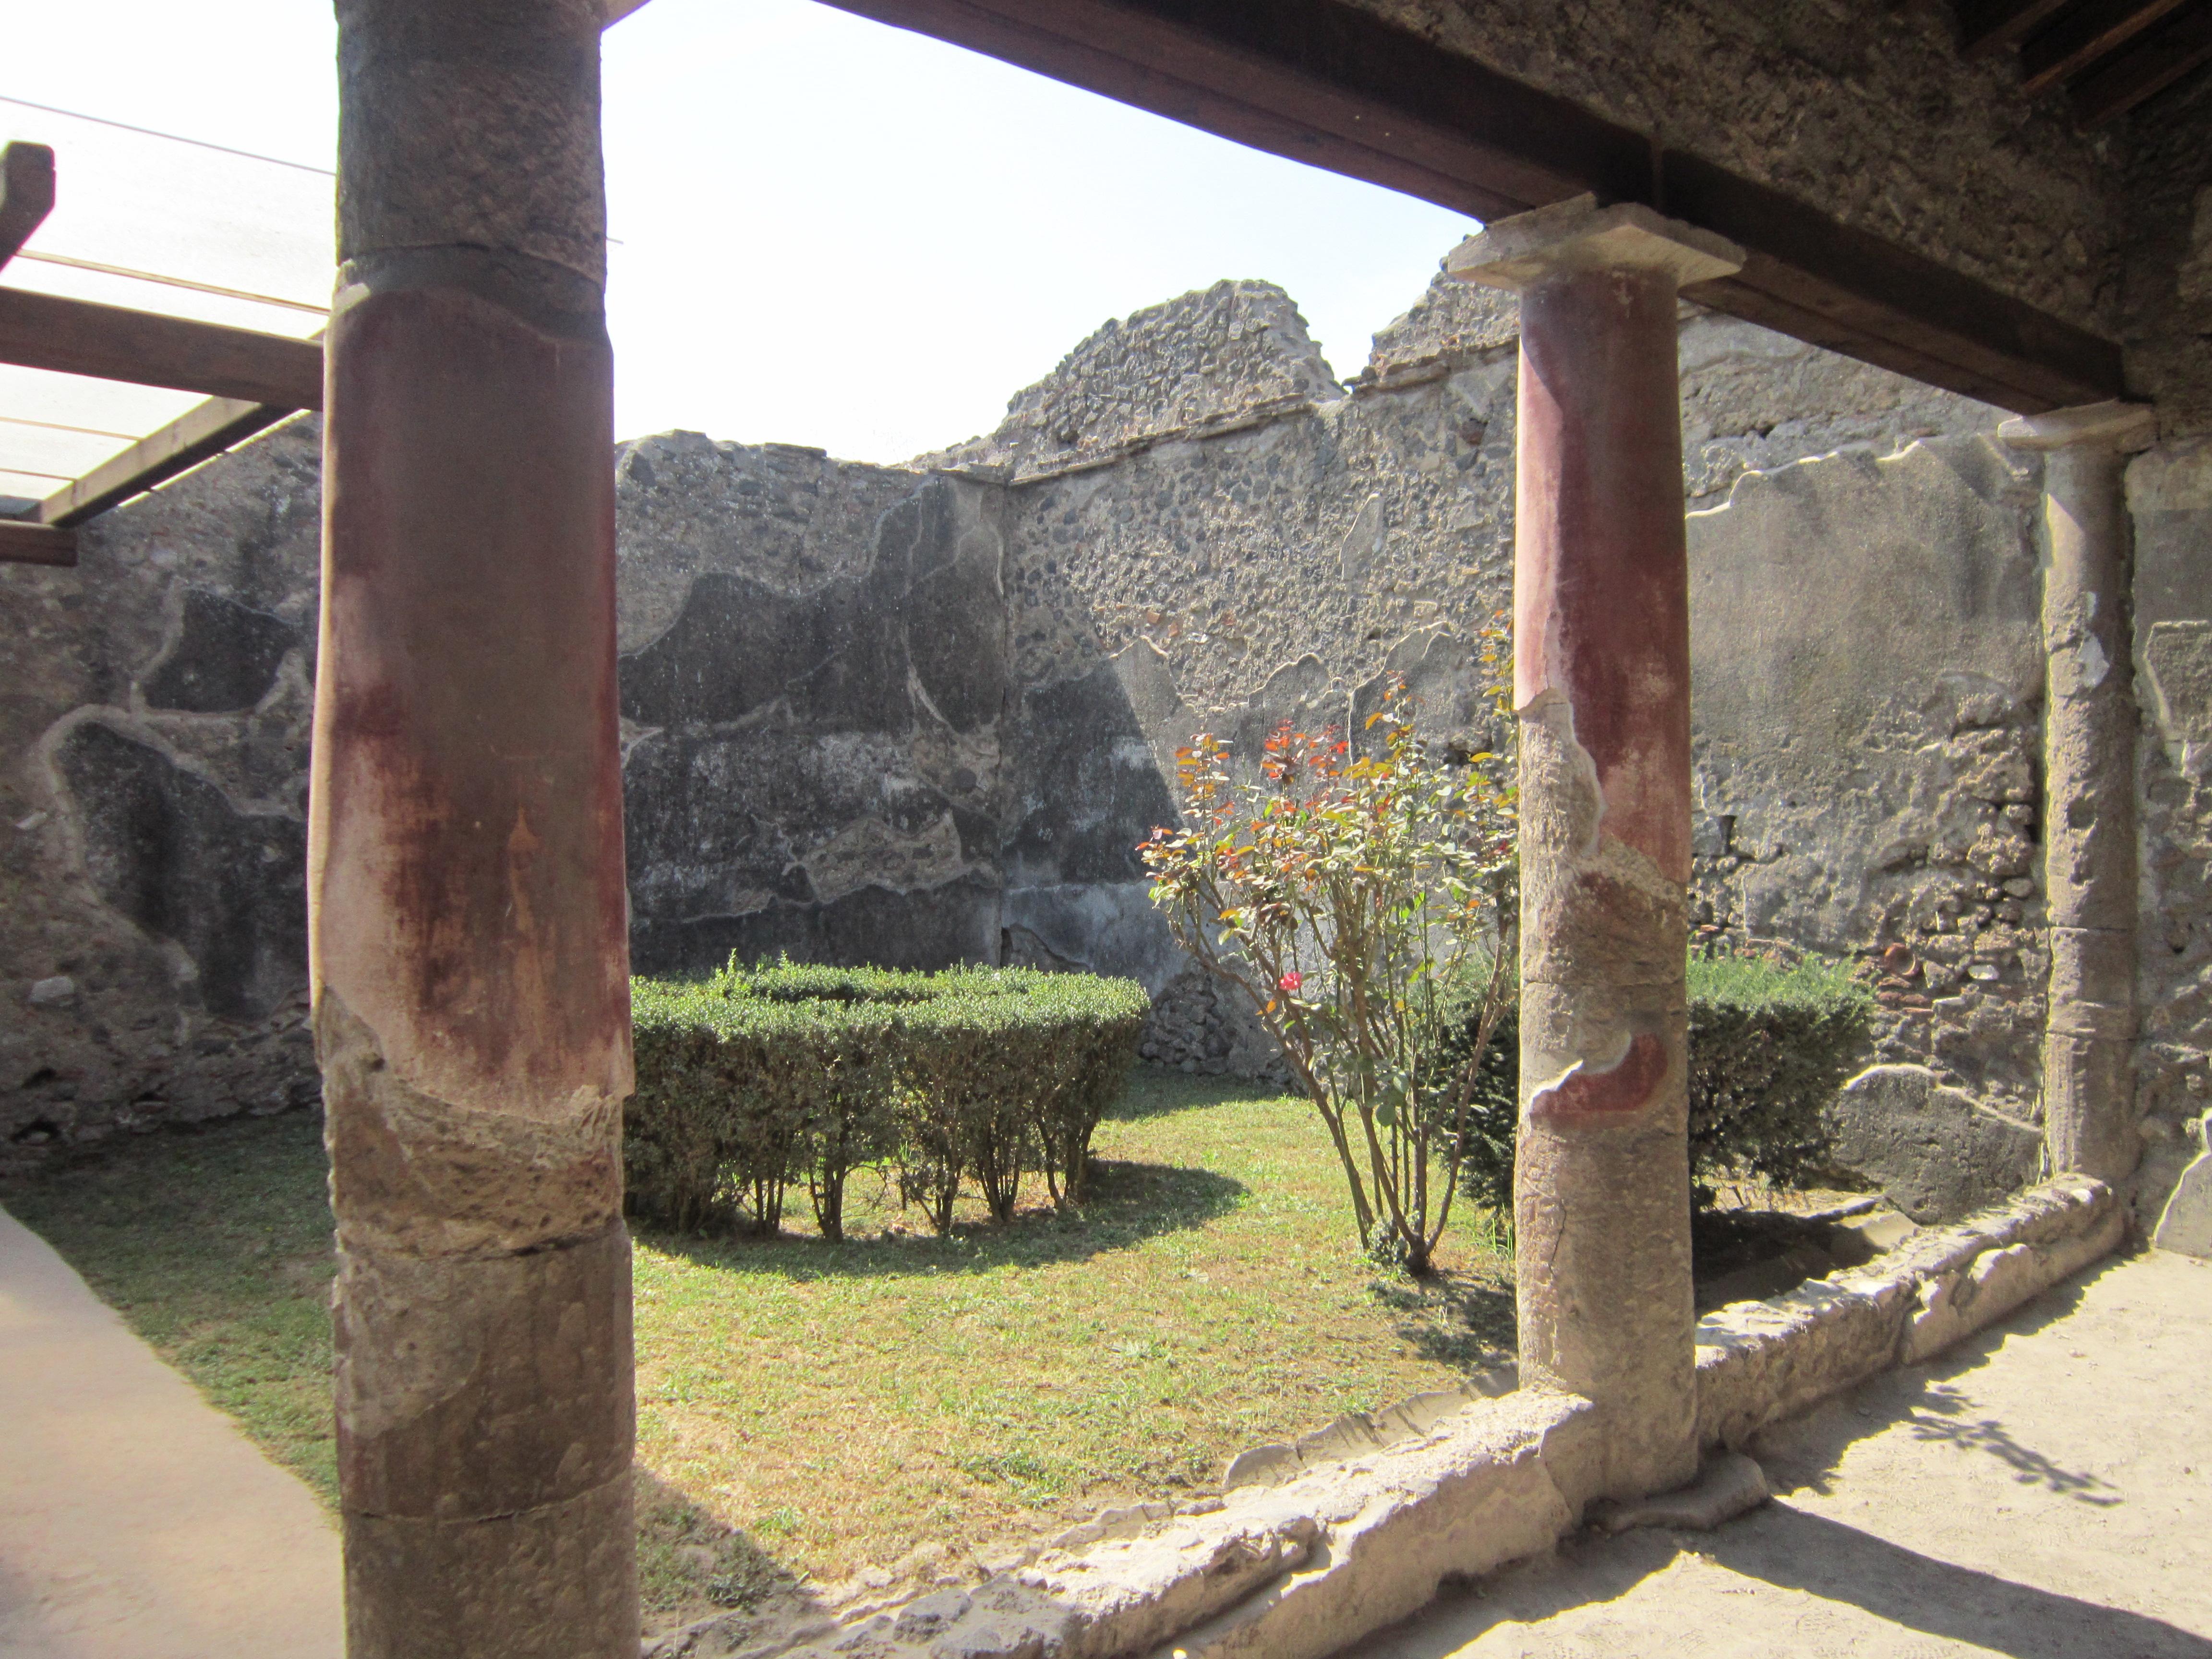 Inside a ruined building Pompeii that has an inner courtyard garden